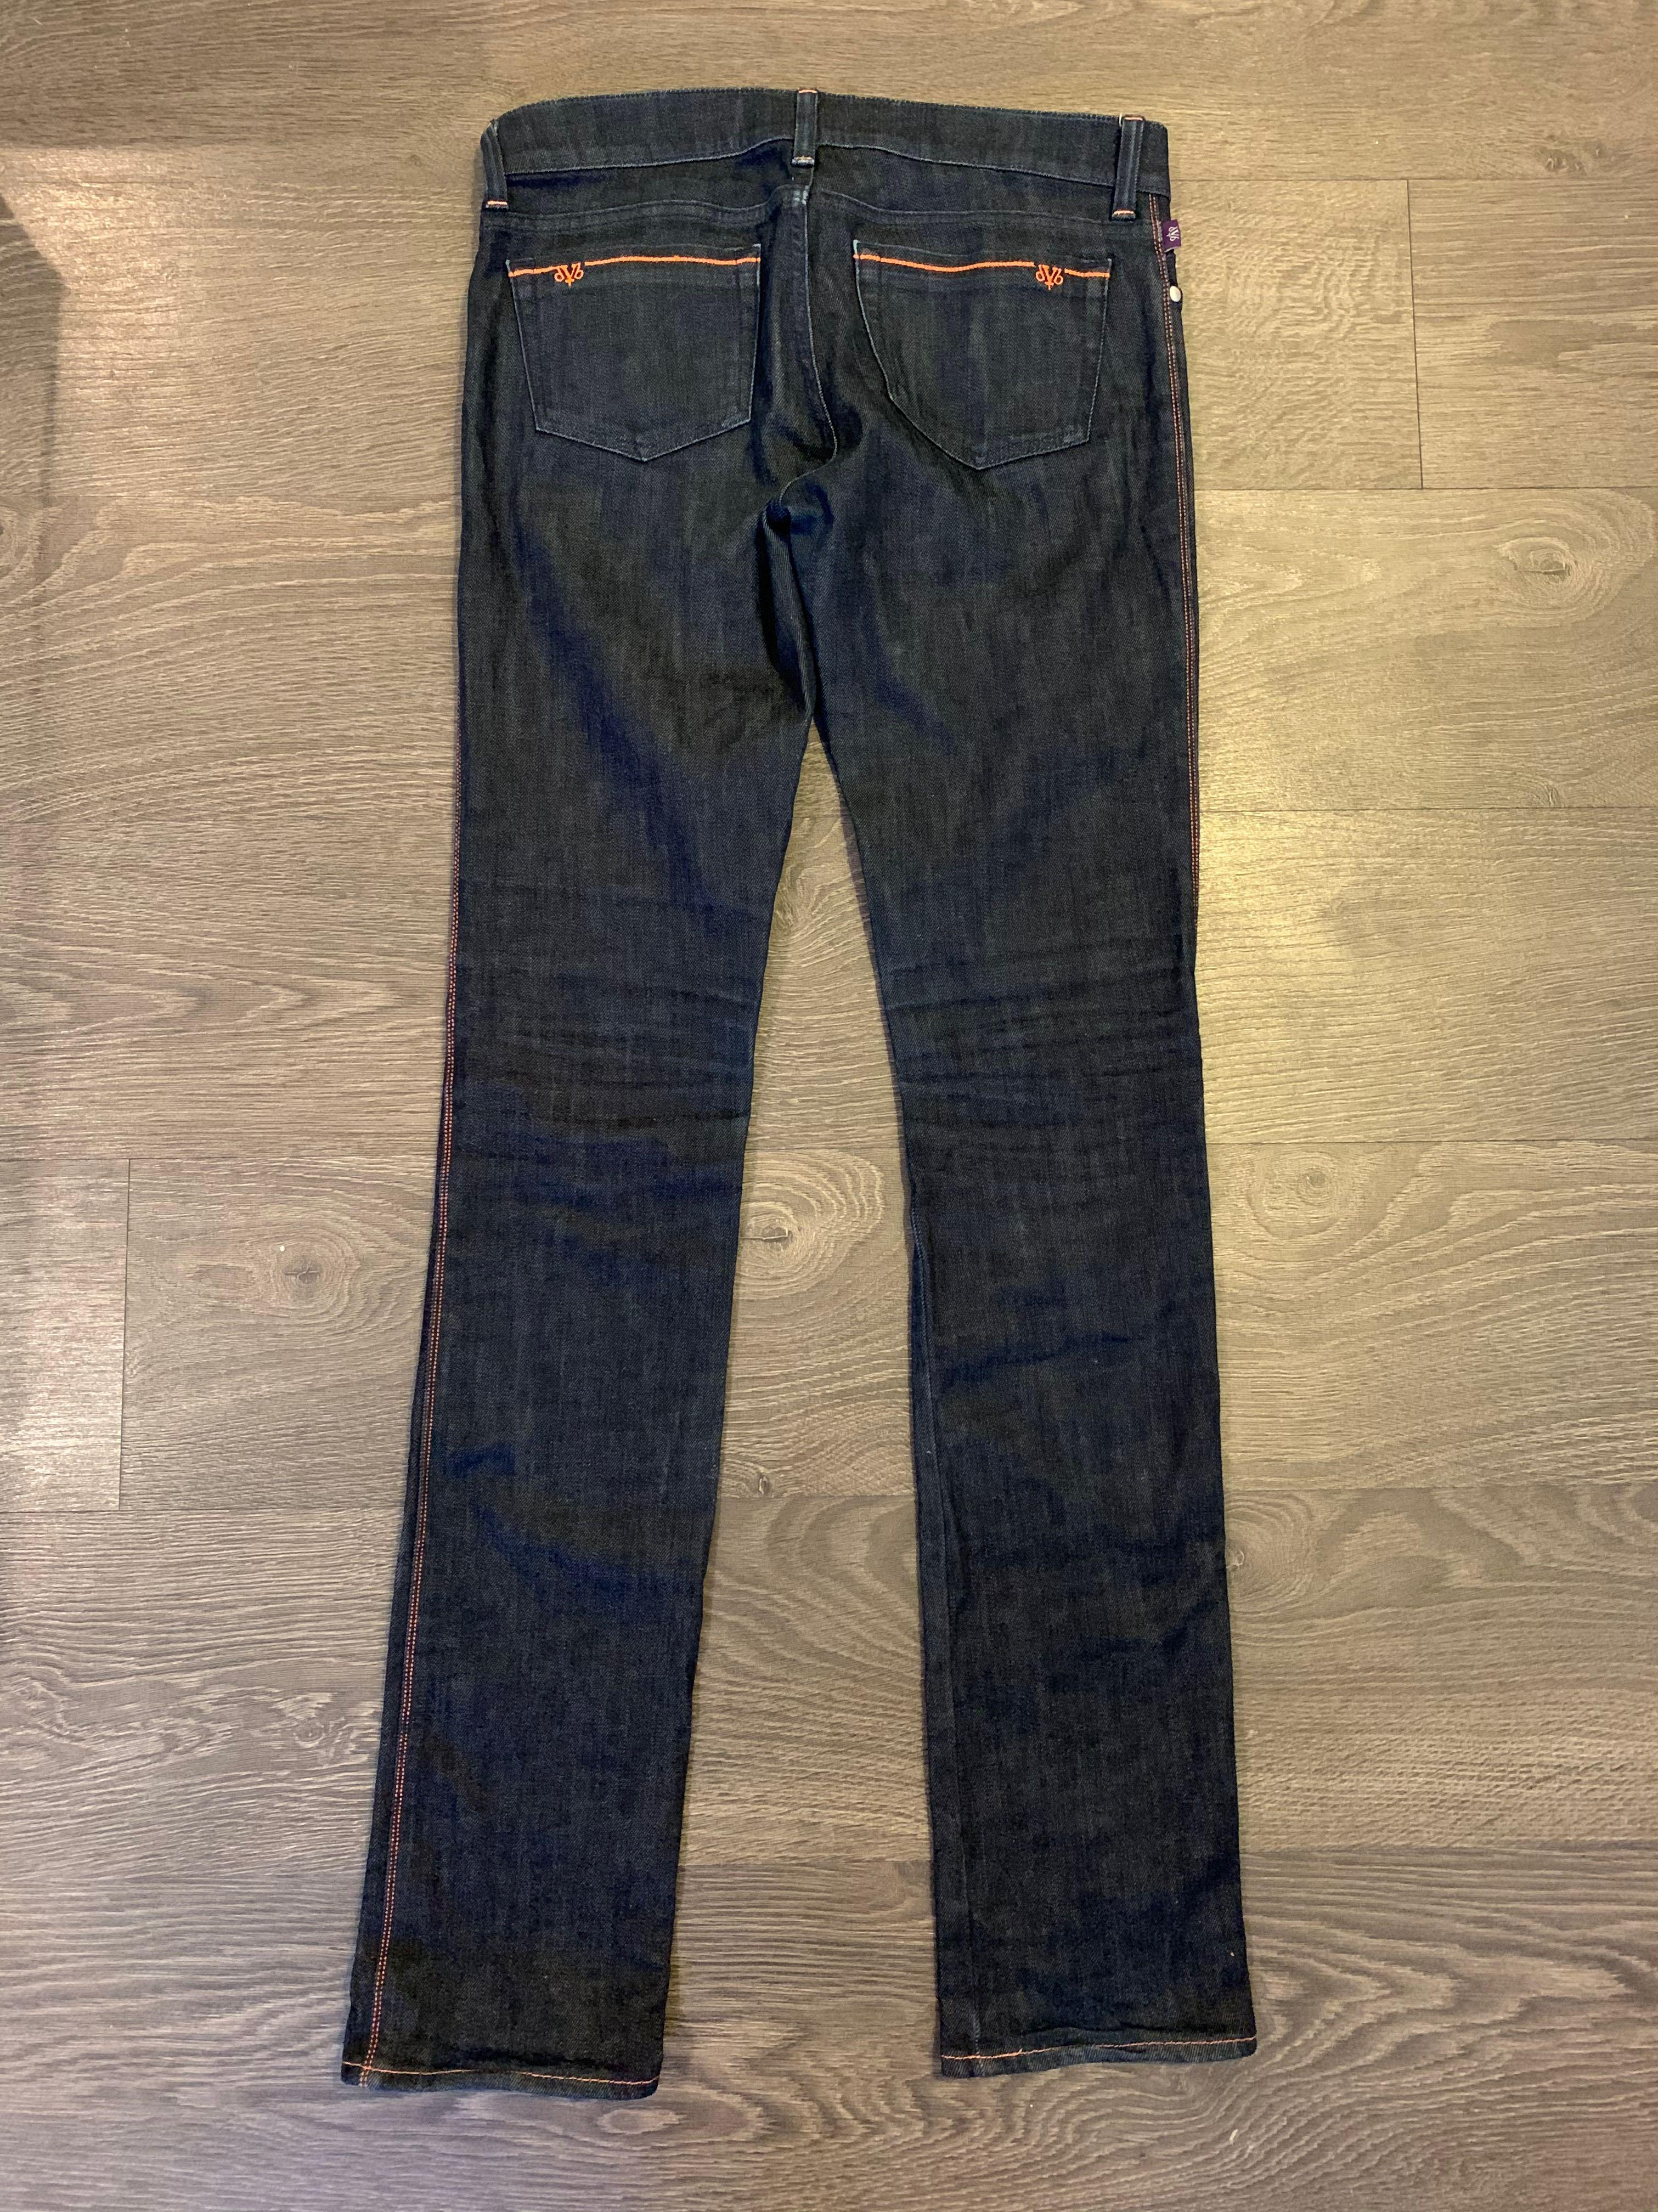 DVB Victoria Beckham Dark Blue Skinny Jeans Size 26